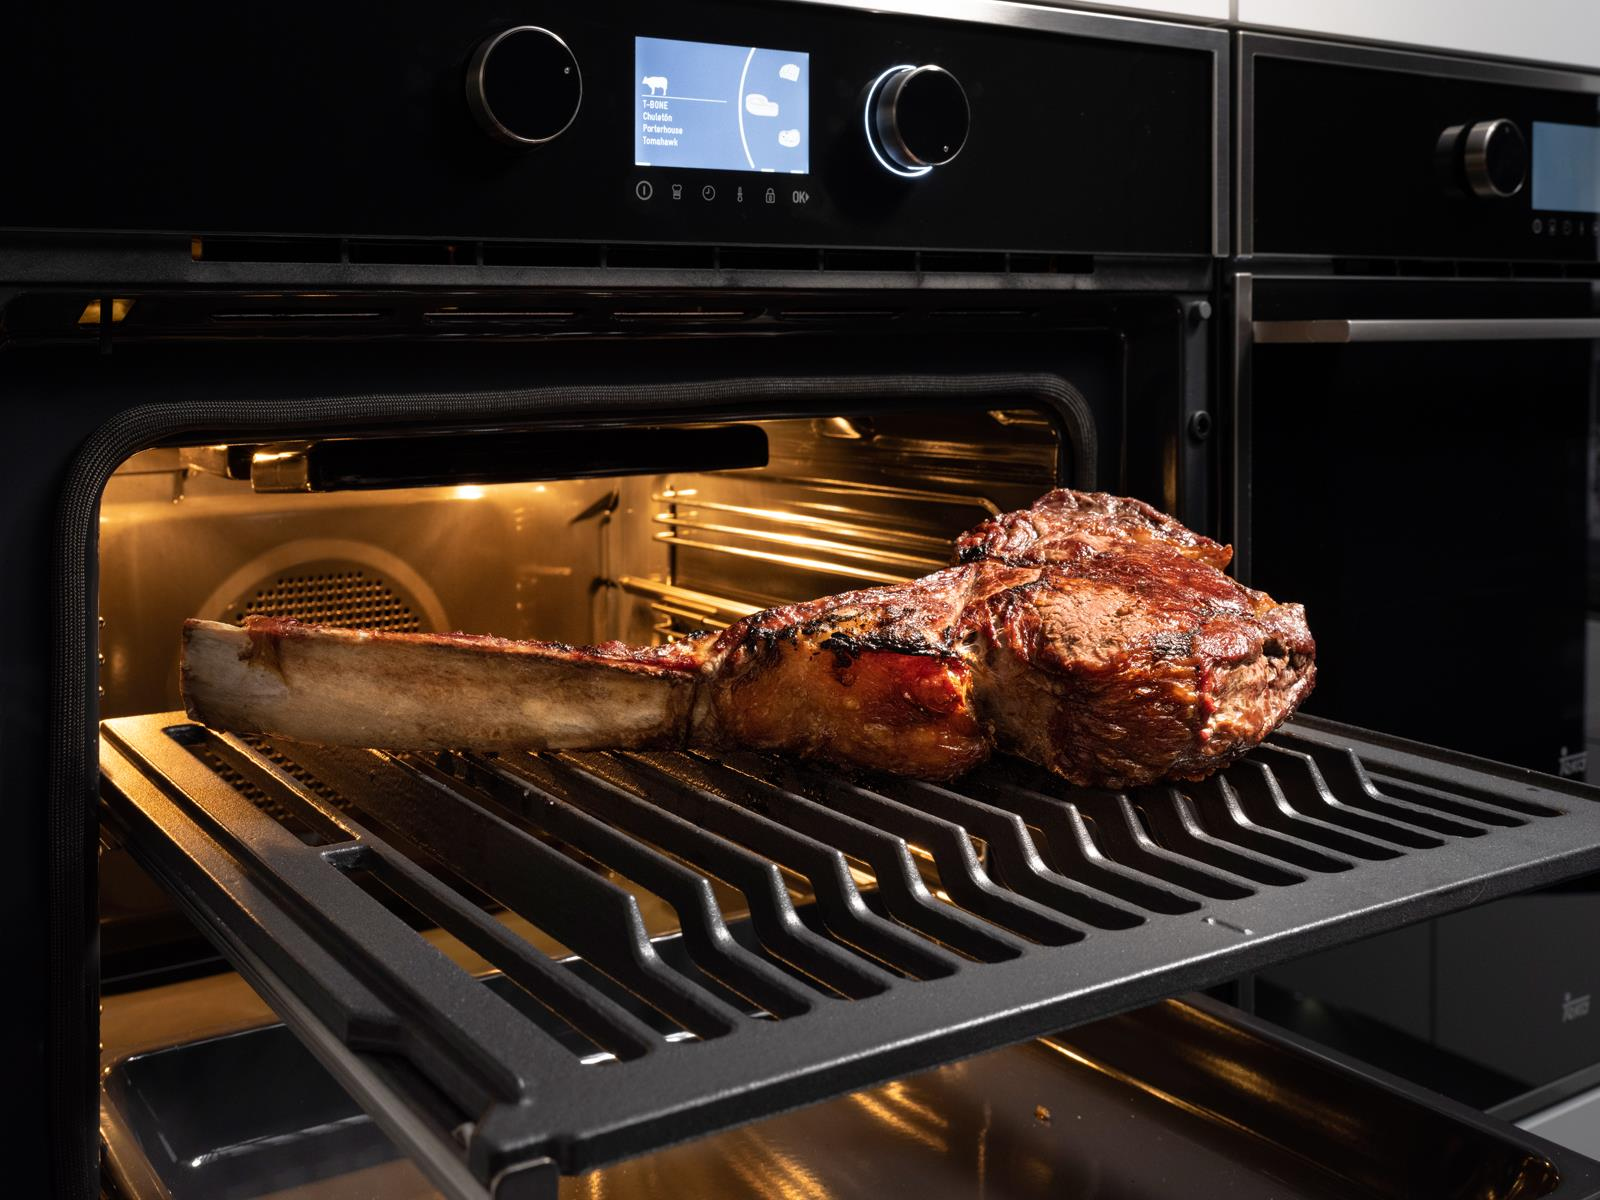 Teka SteakMaster Pyrolyse Backofen 700°C Power-Grill inkl. Gourmet-Fleischpaket